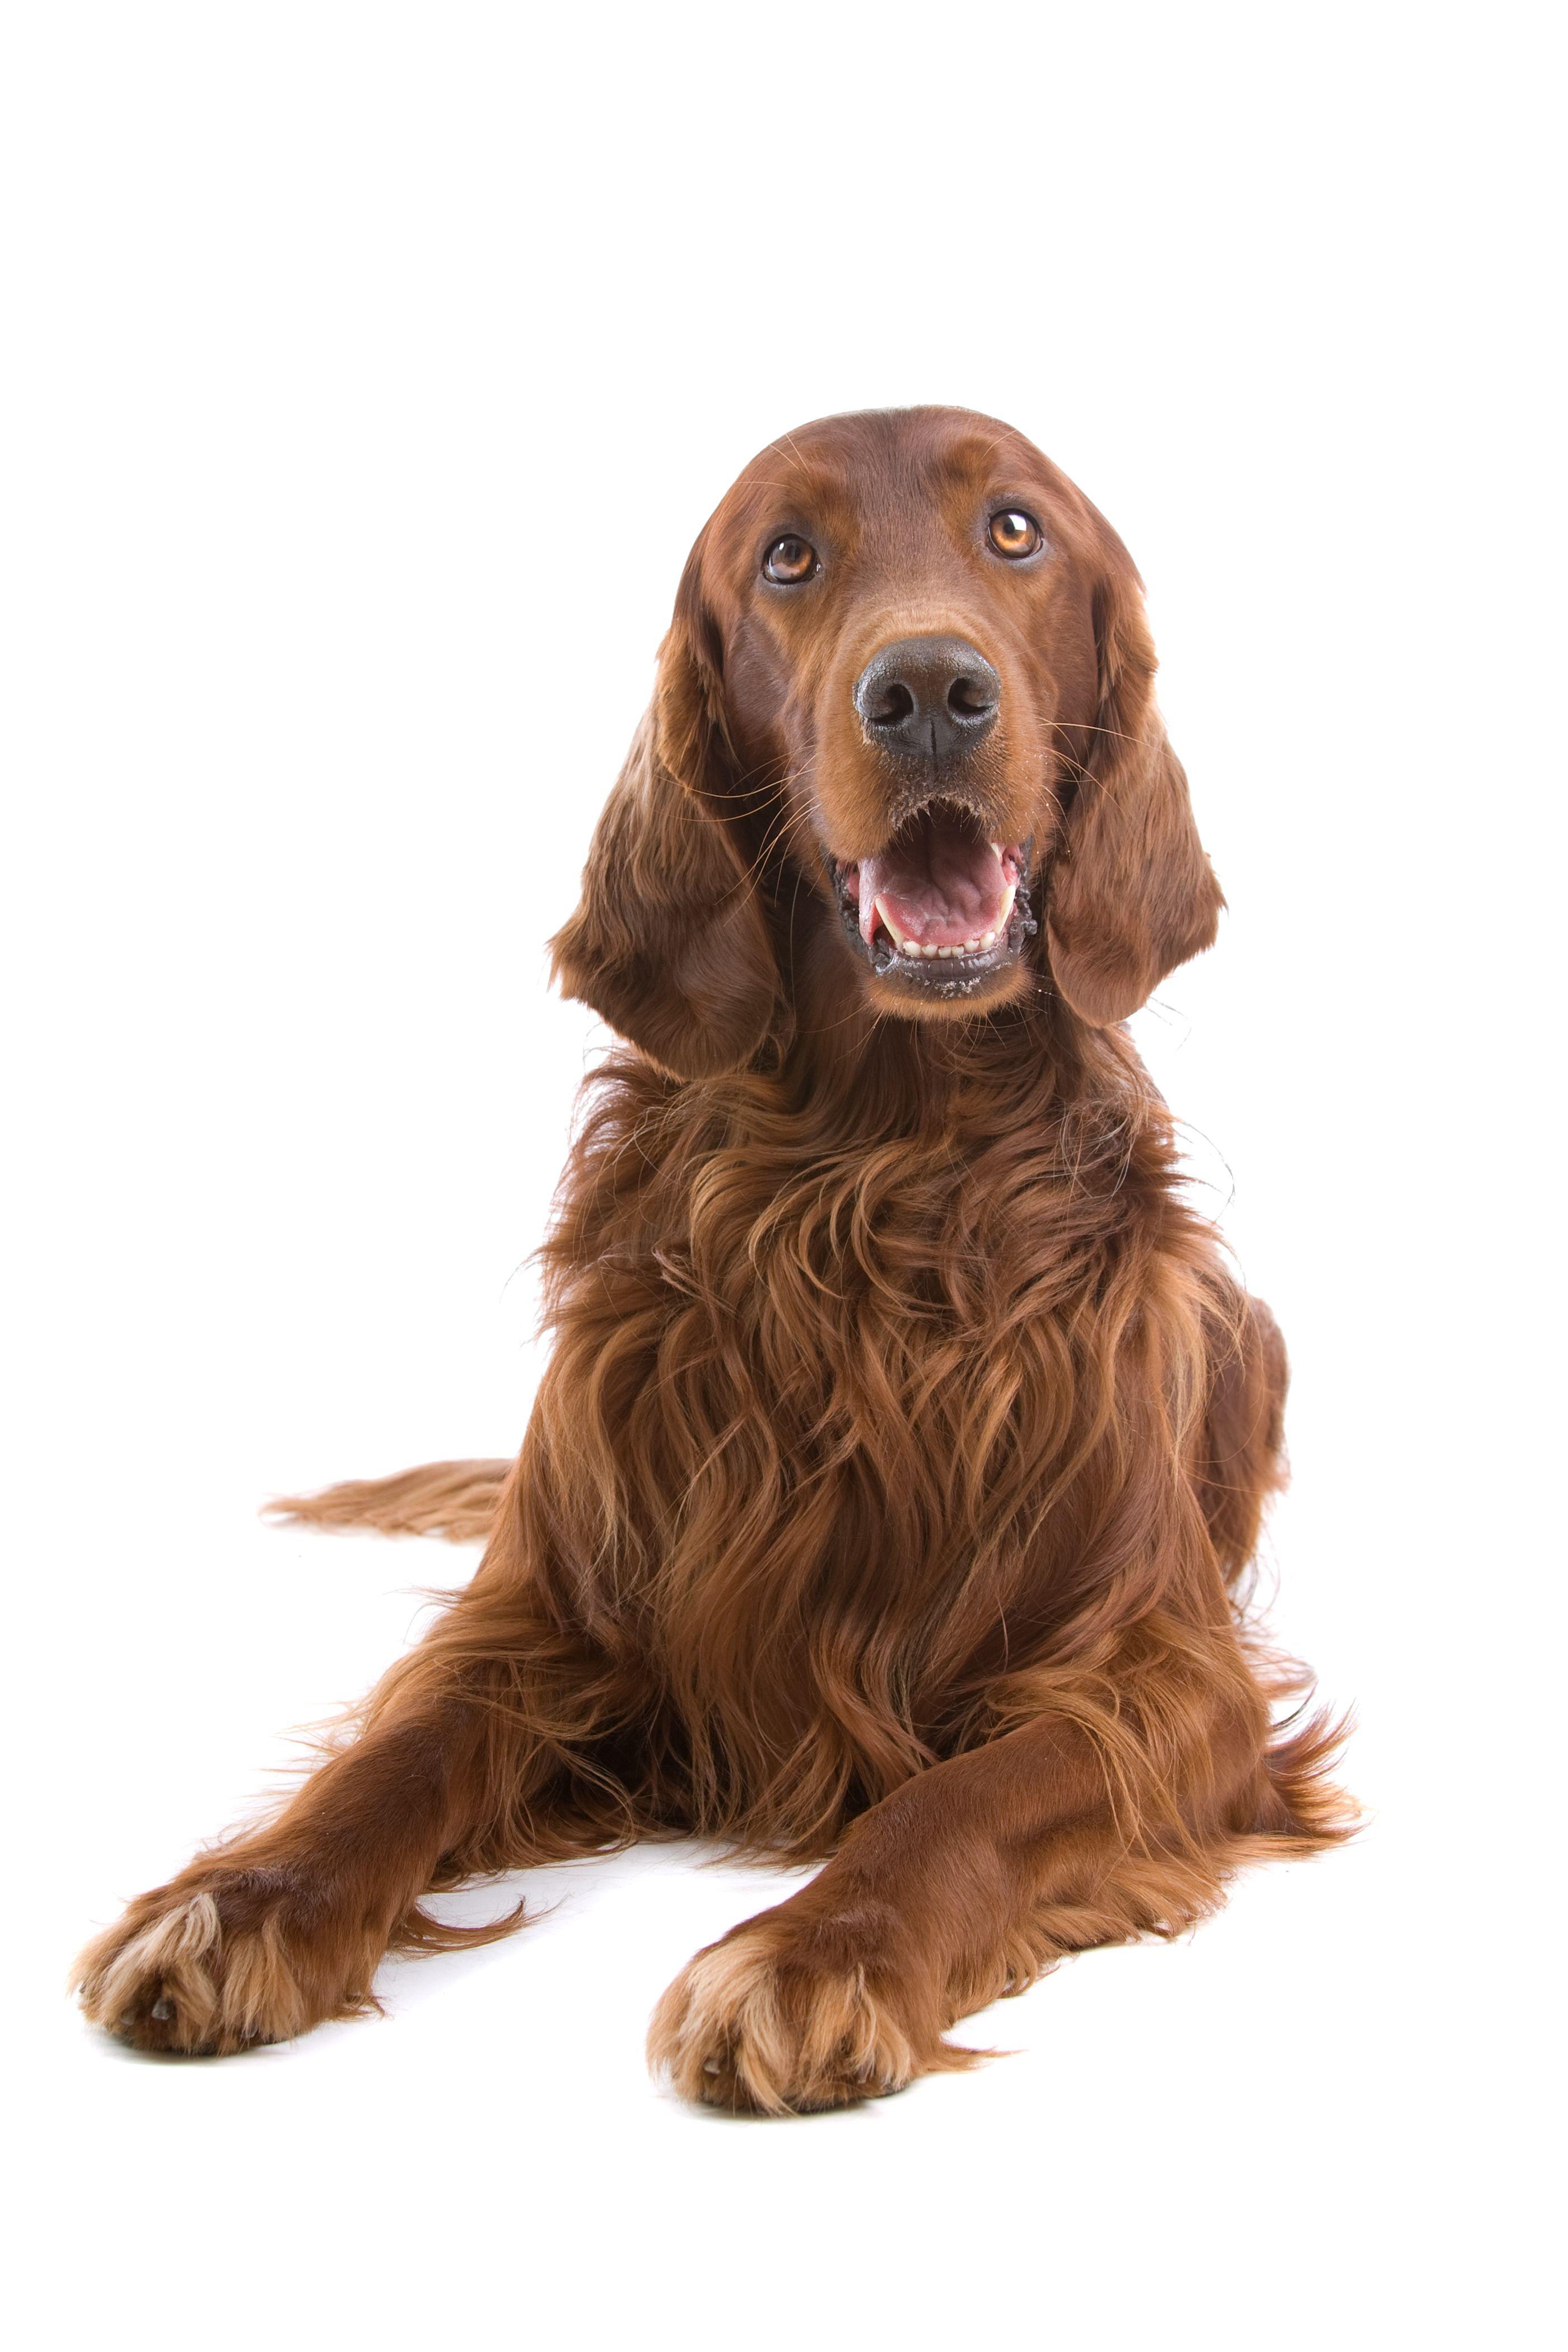 Spin And Bear It The Effects Of Vestibular Disease Irish Setter Dogs Dogs Dog Cat